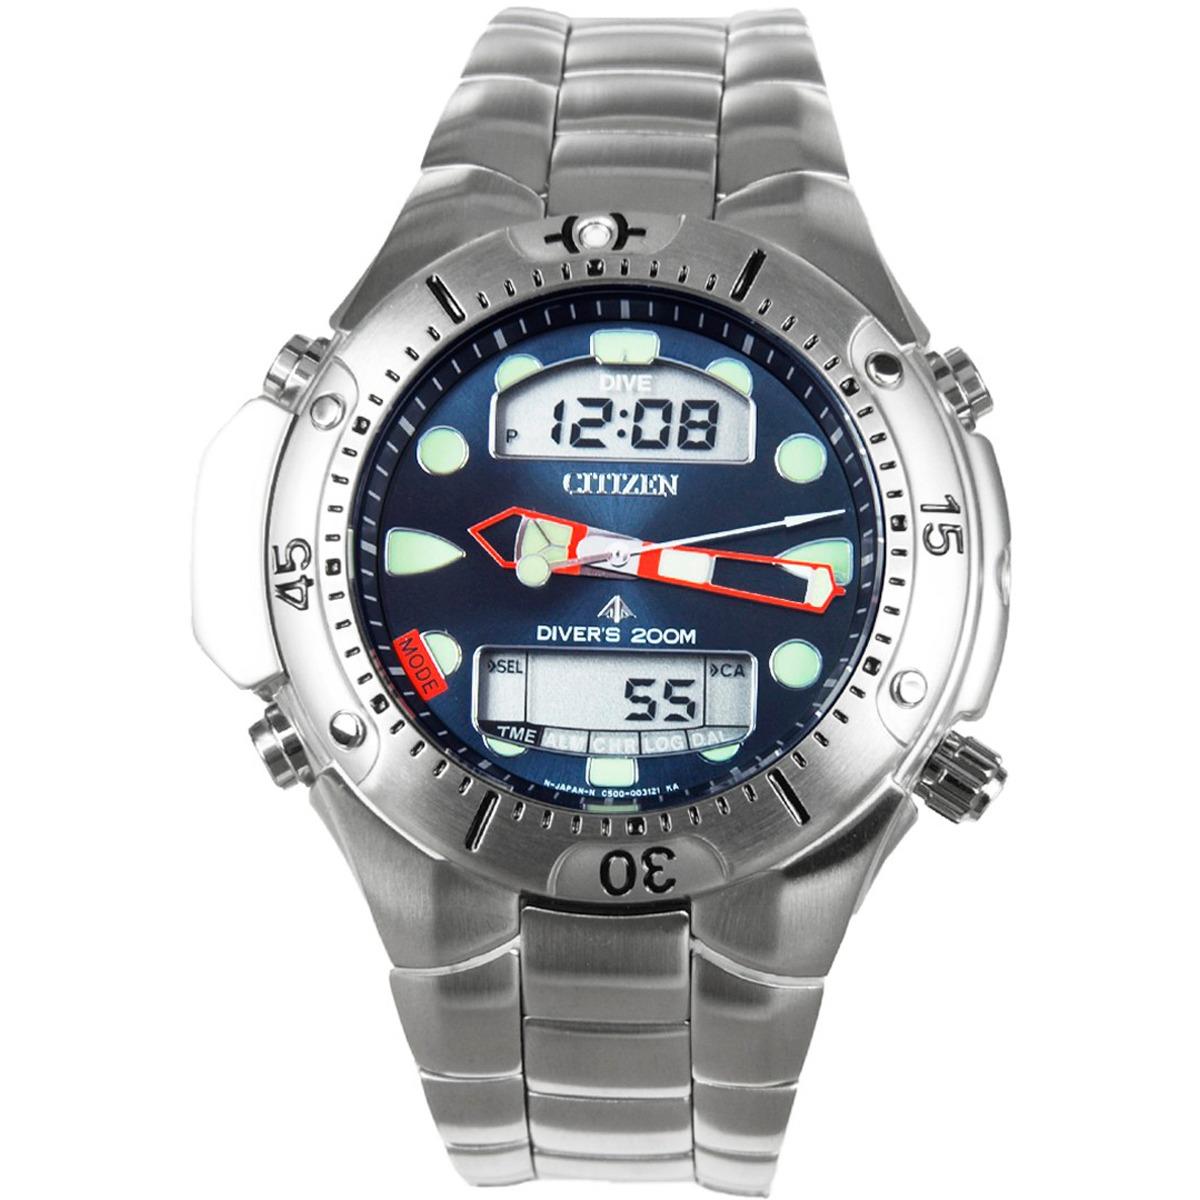 32af2b4282d Relógio Citizen Aqualand Ii - Jp1060-52l - R  1.899